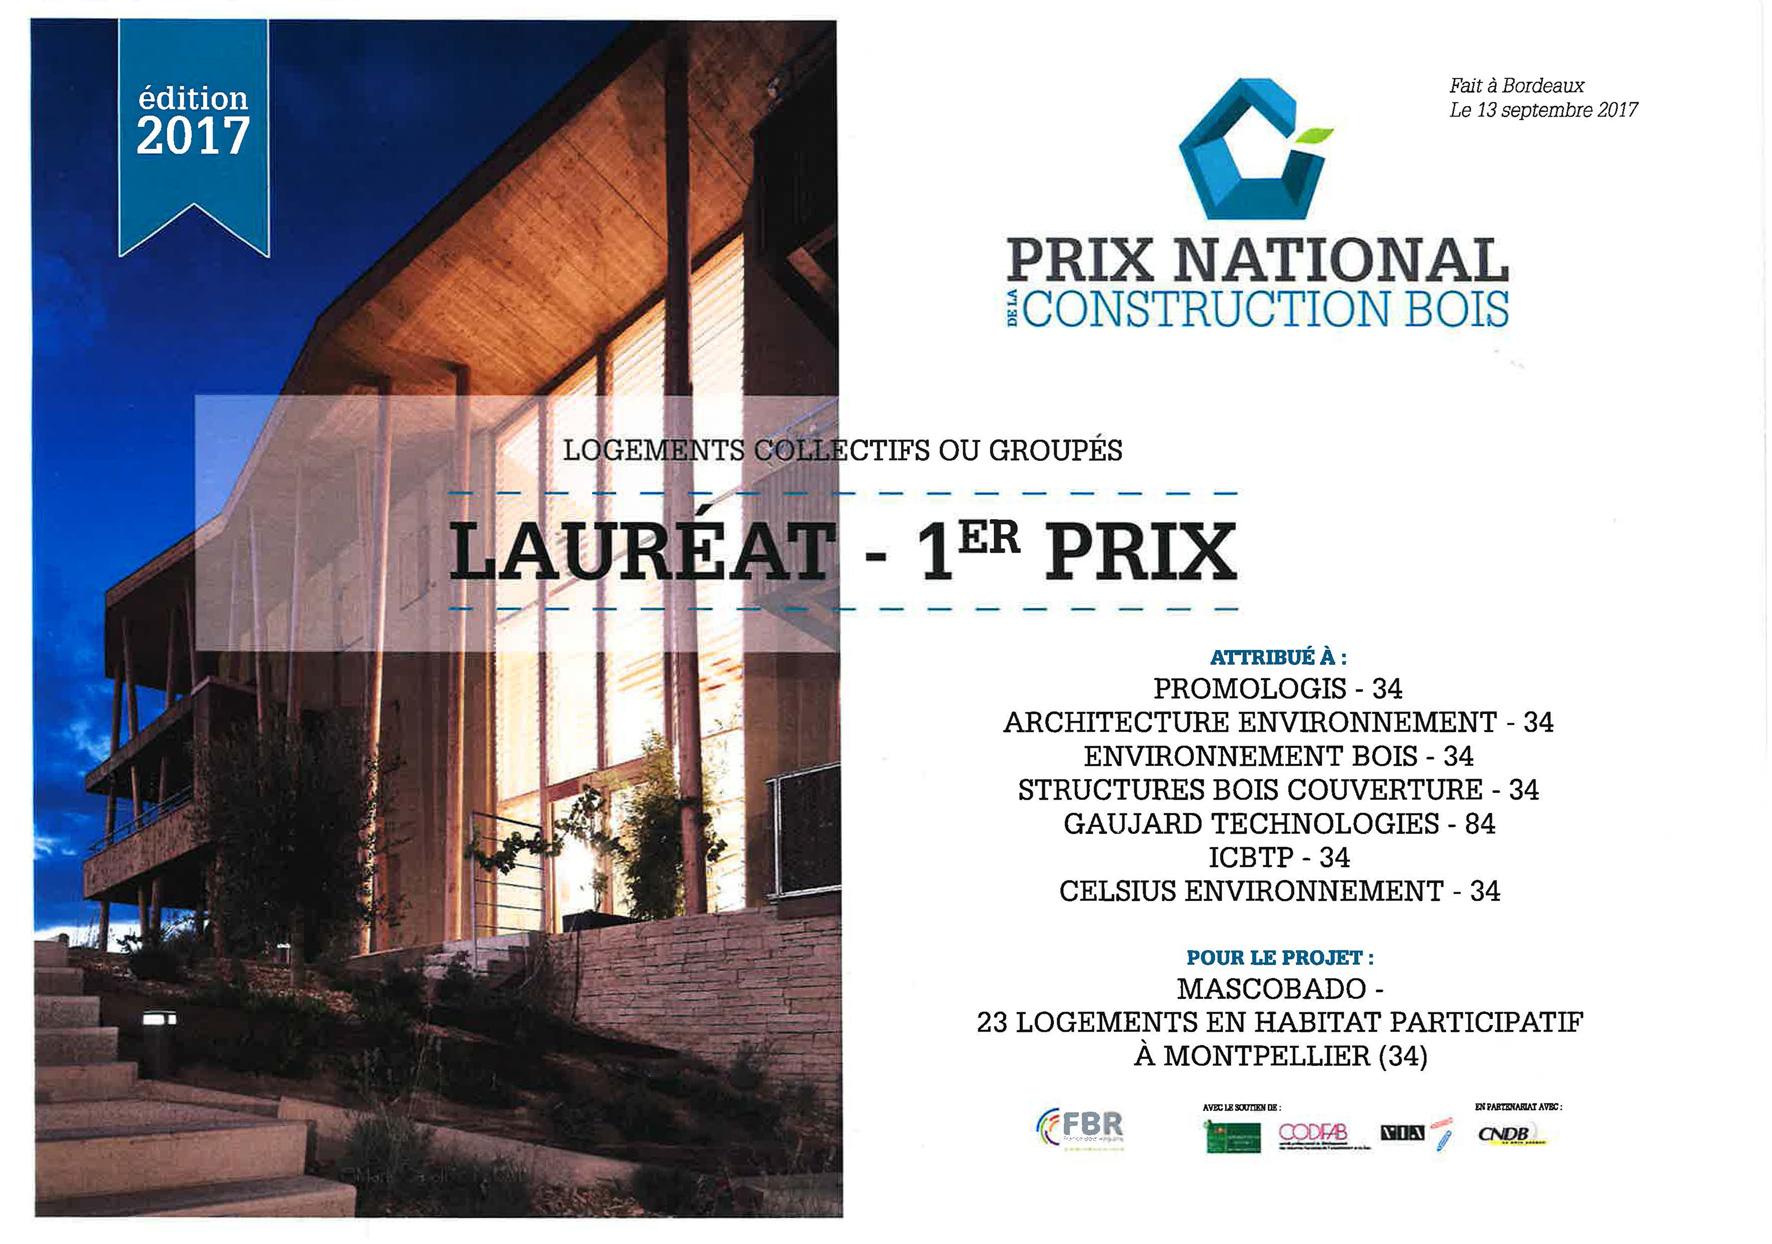 2017_mascobado_laureat-1er-prix_prix-national-de-la-construct-bois_